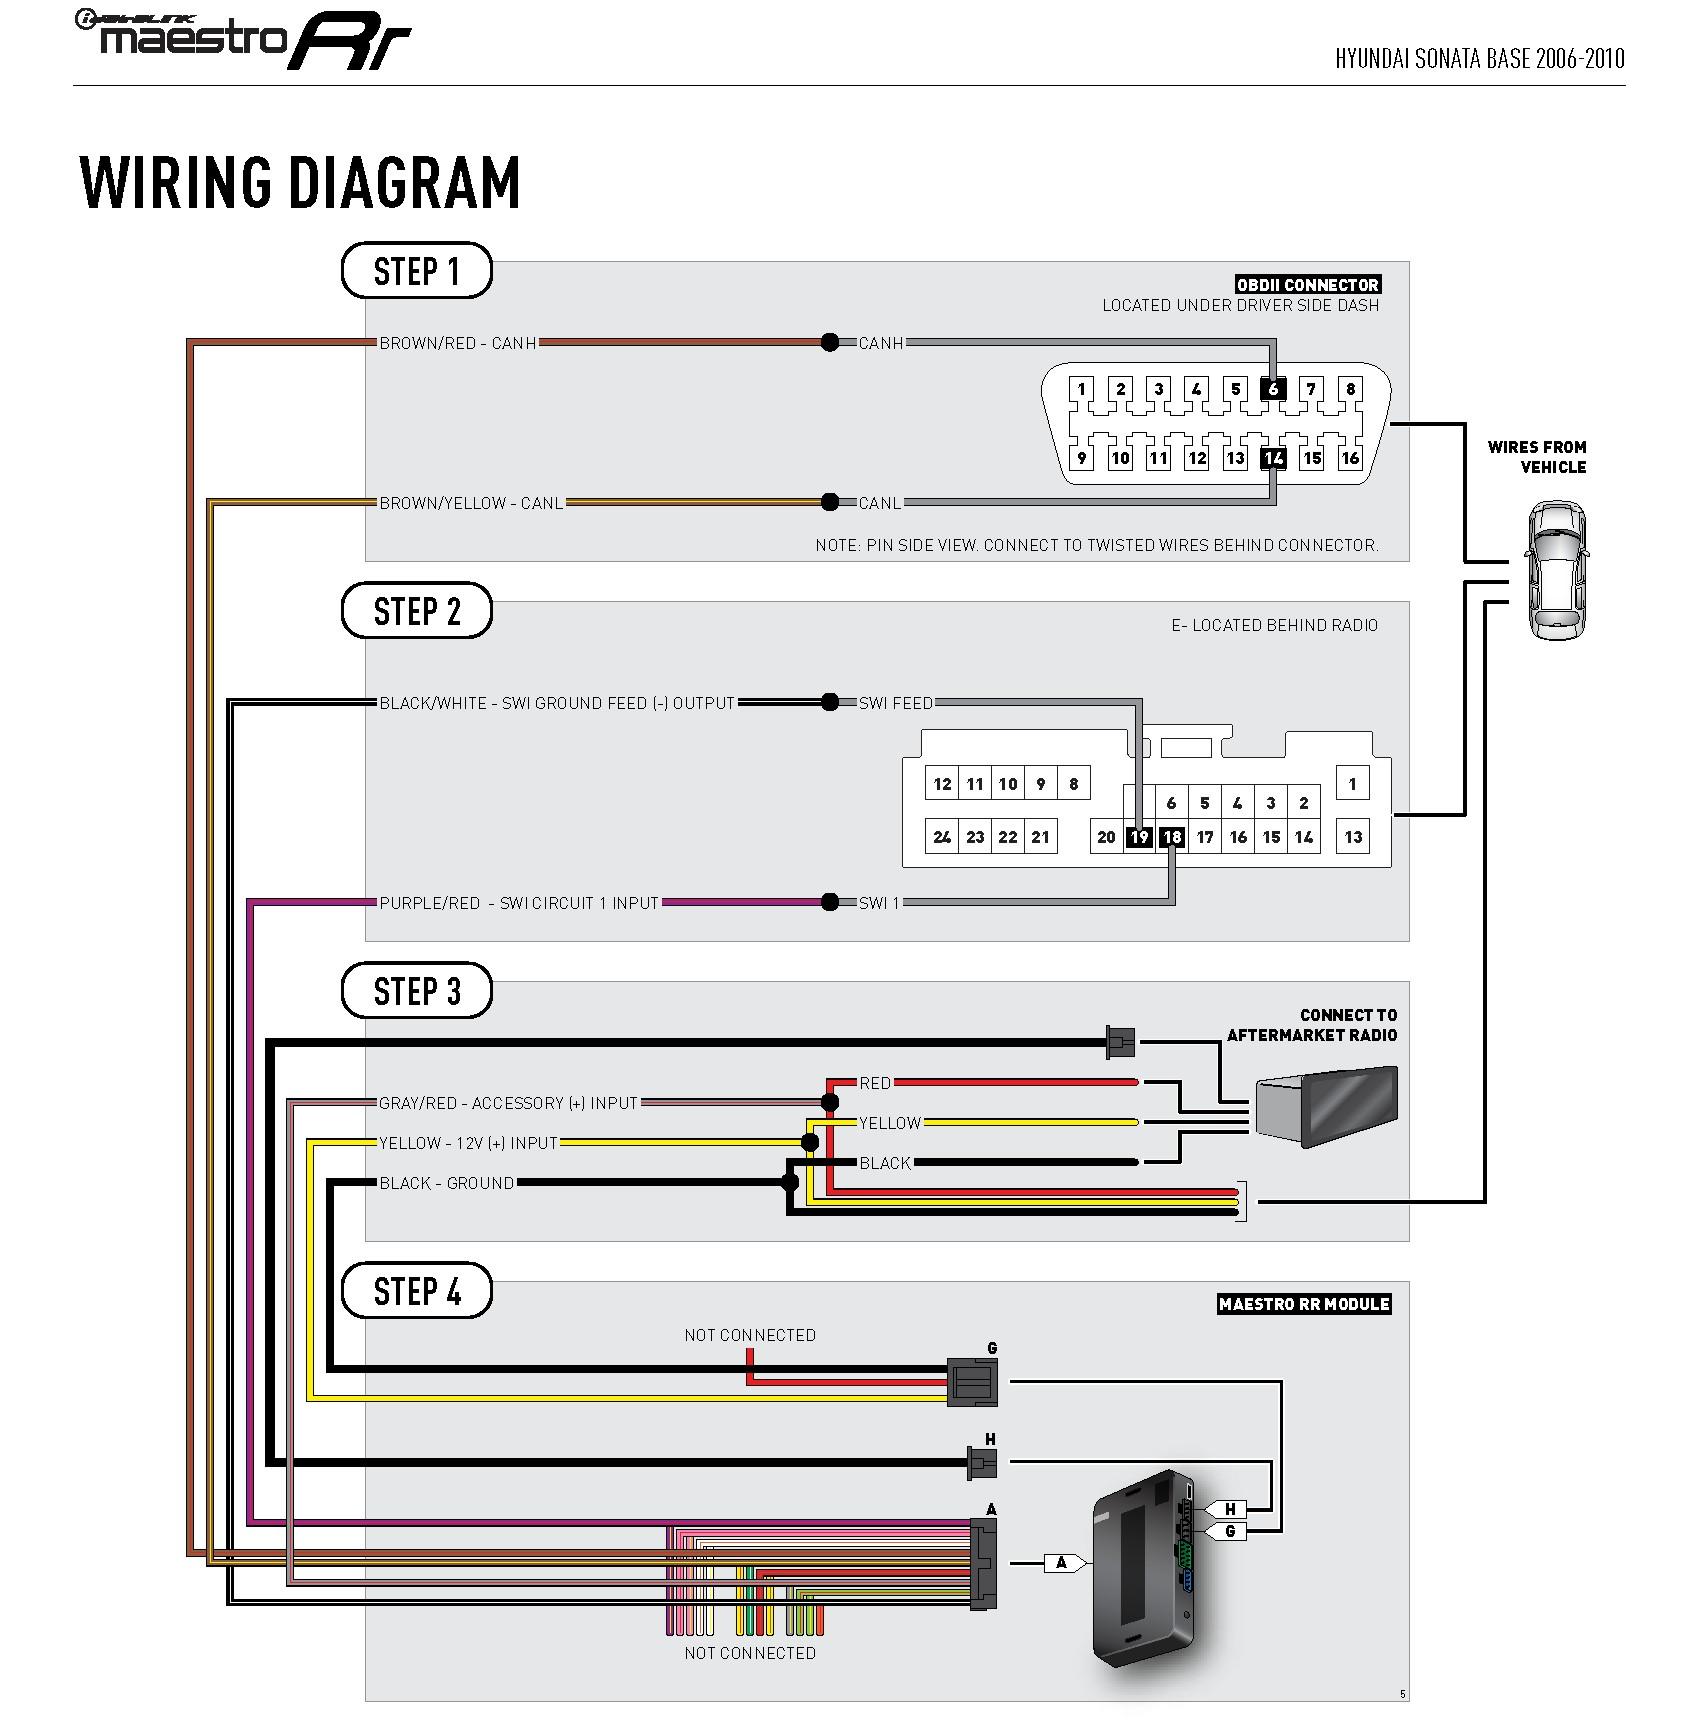 Maestro Rr Wiring Diagram 2018 Toyota Highlander